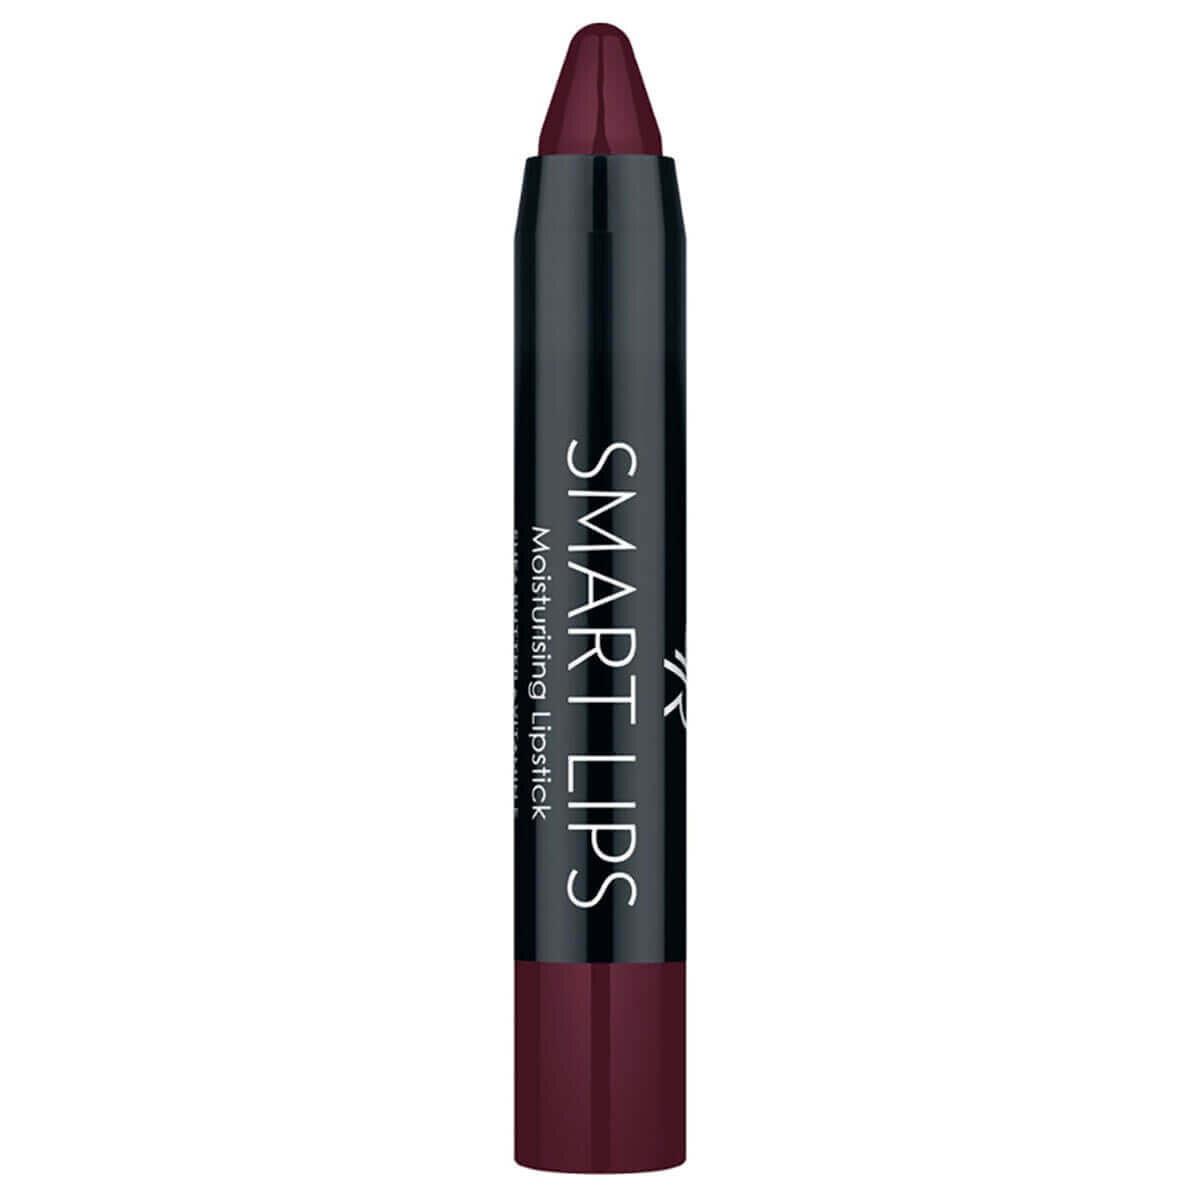 Smart Lip Moisturising Lipstick Ruj No. 21